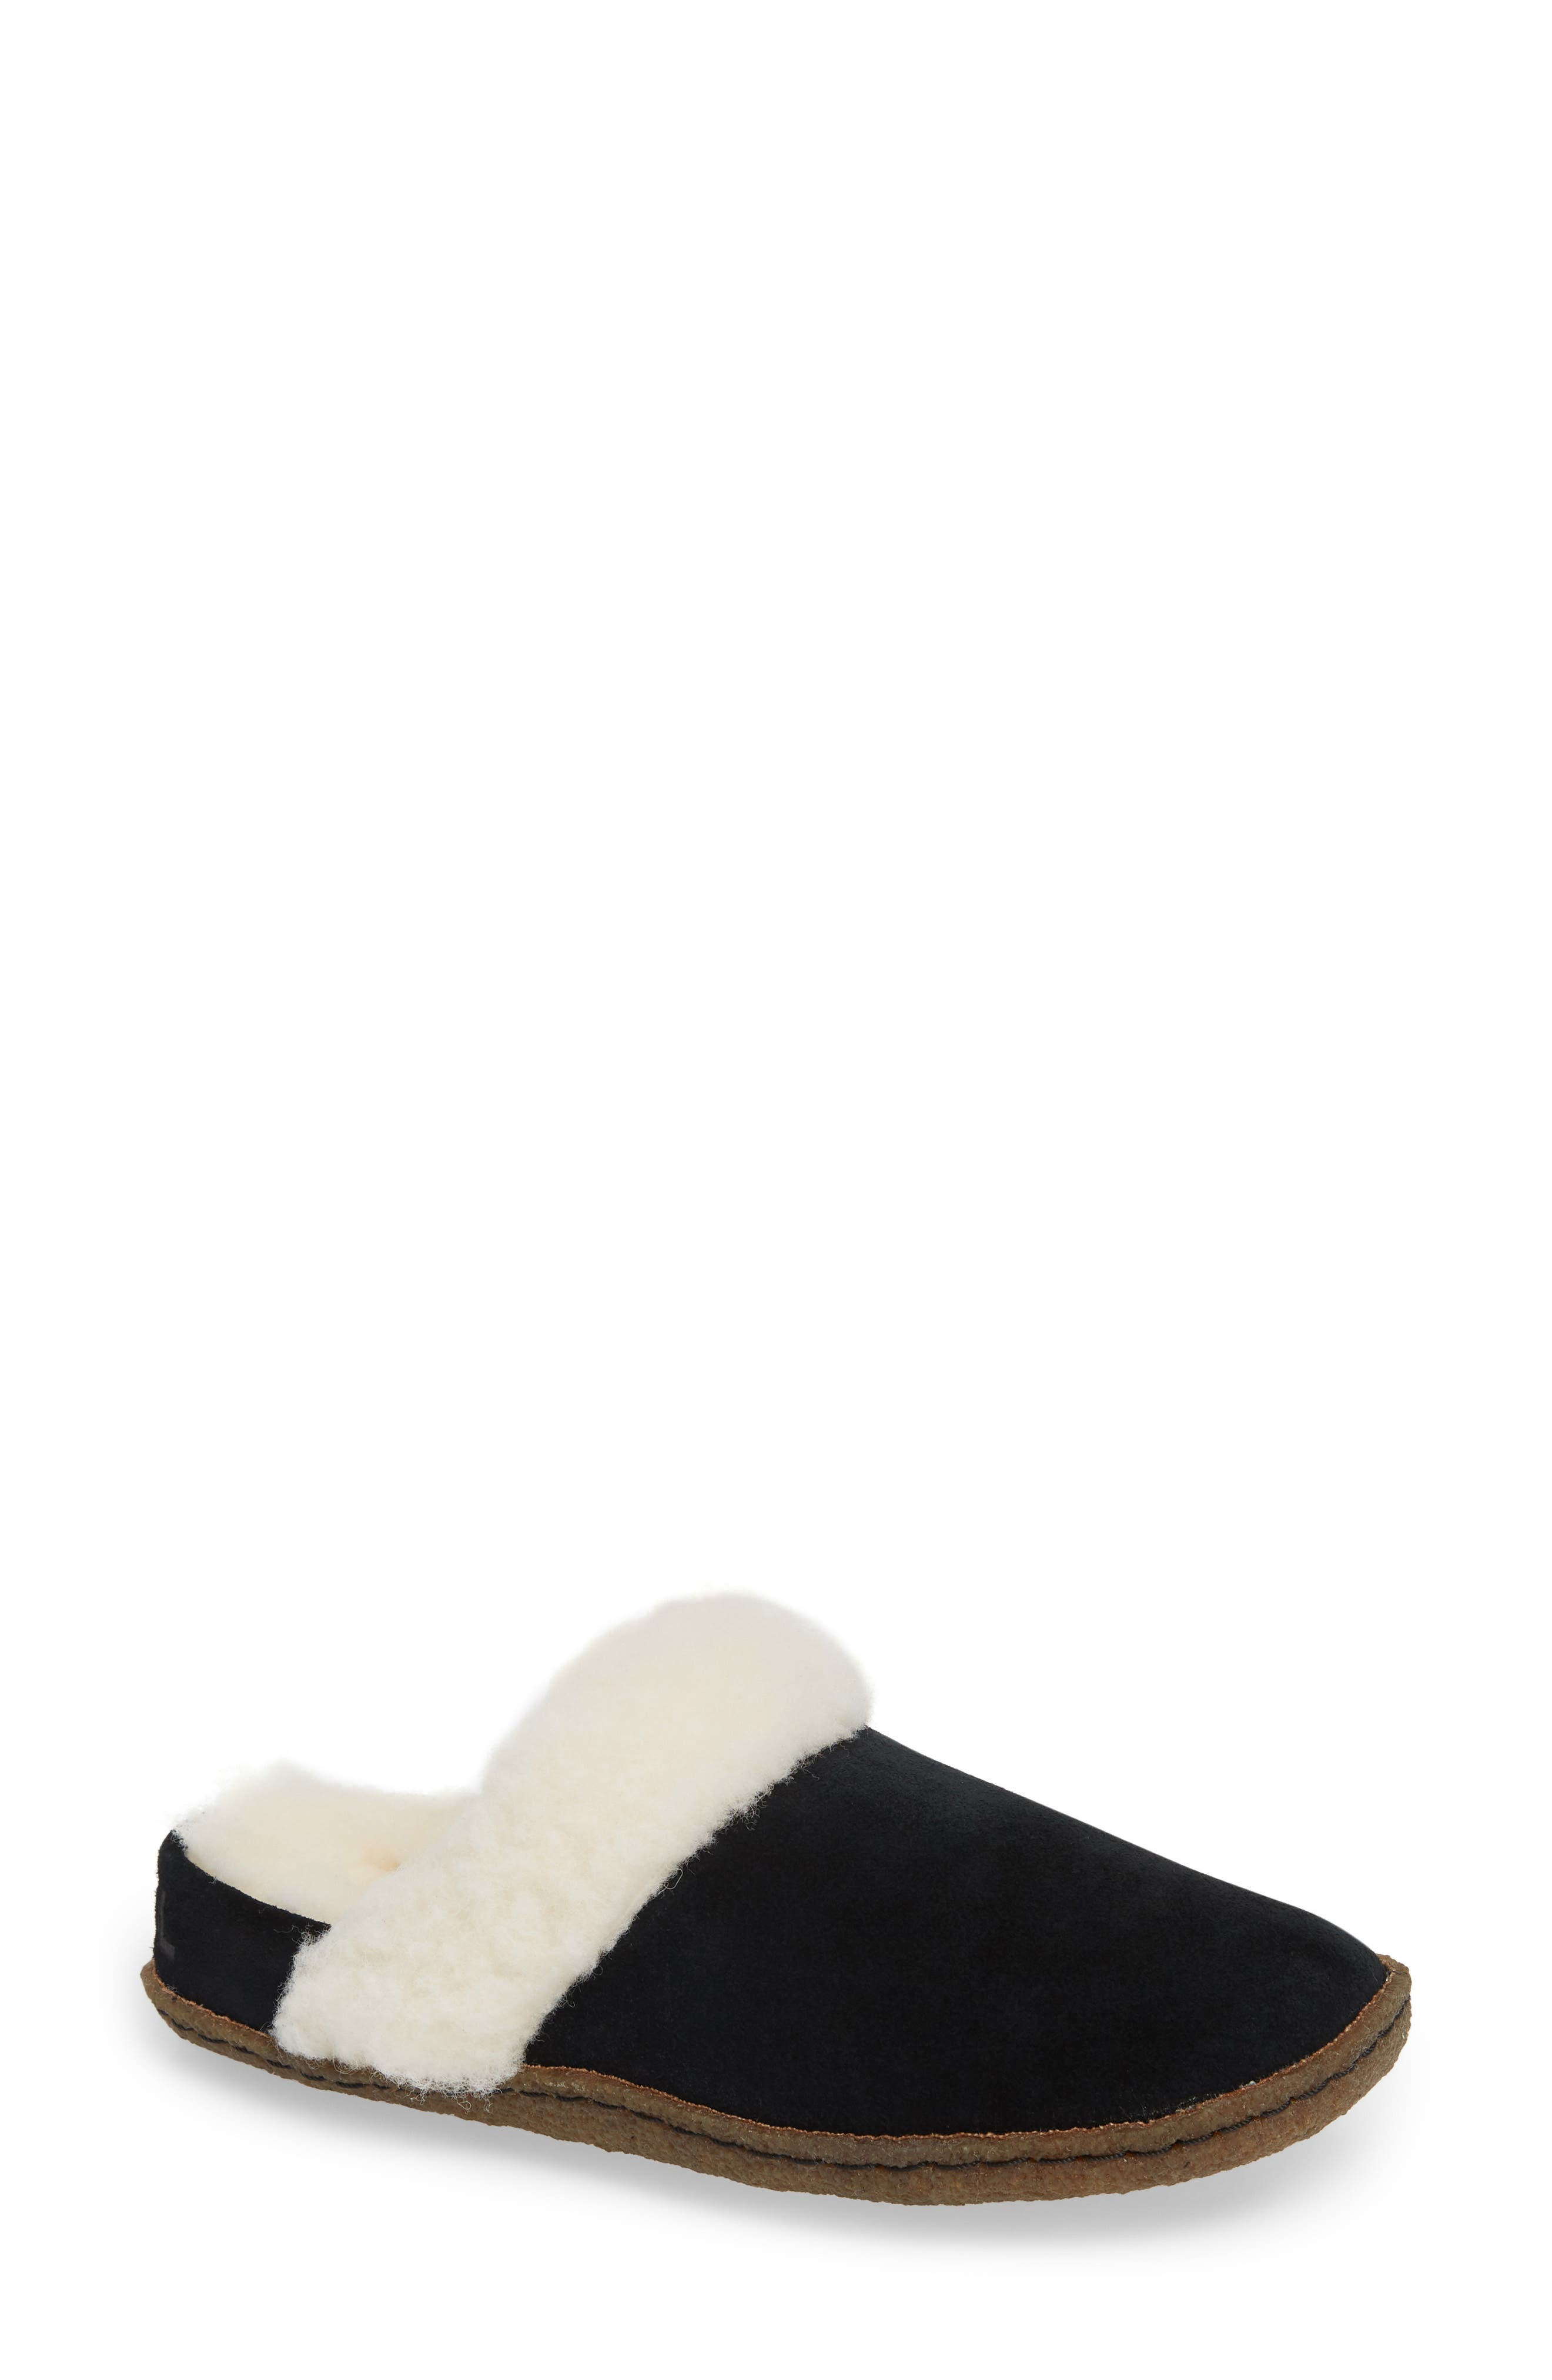 Nakiska II Faux Shearling Lined Slide Slipper,                         Main,                         color, BLACK/ NATURAL